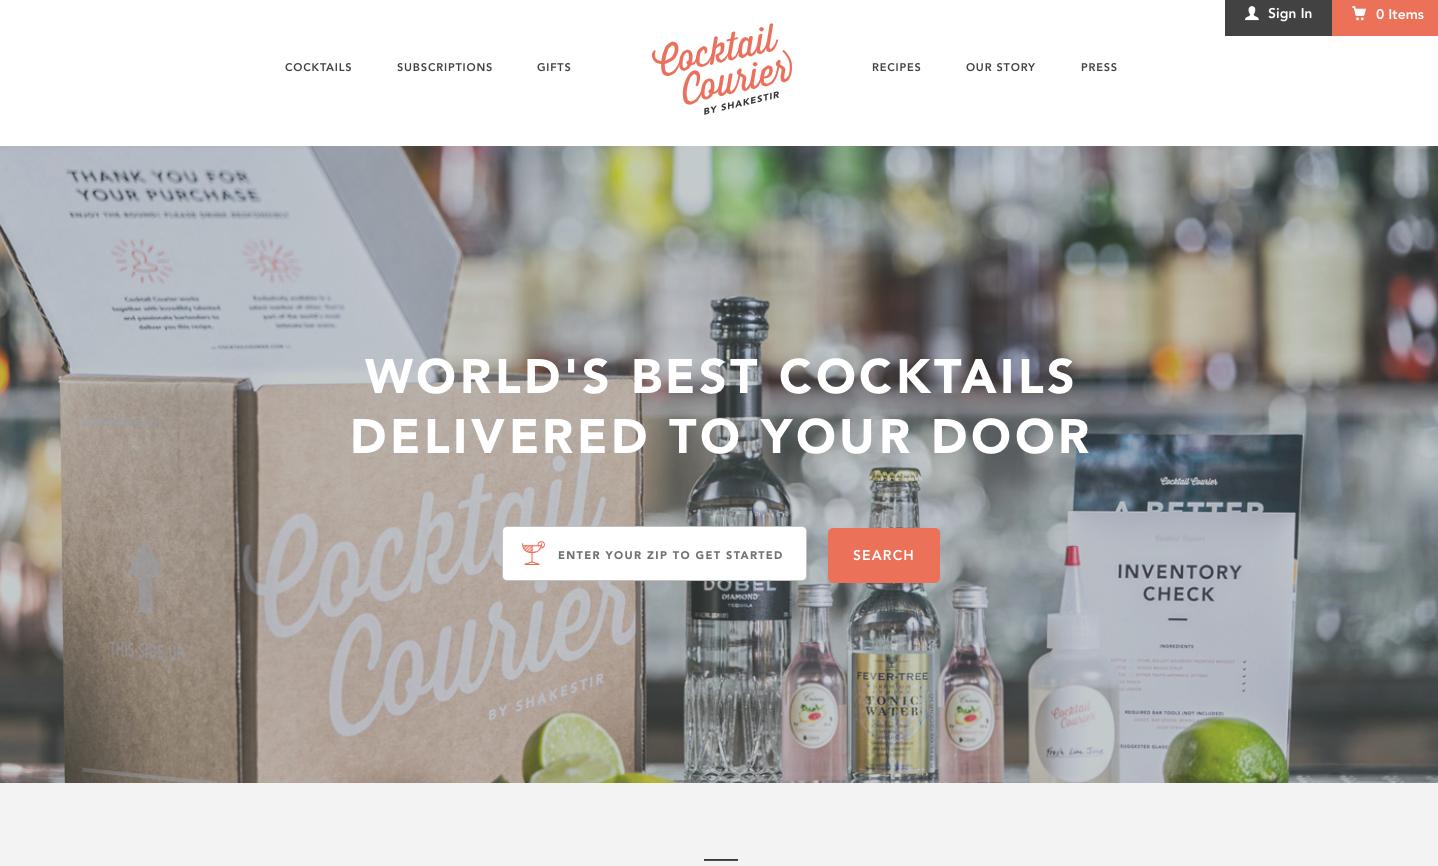 online- drink-shop-cocktail courier